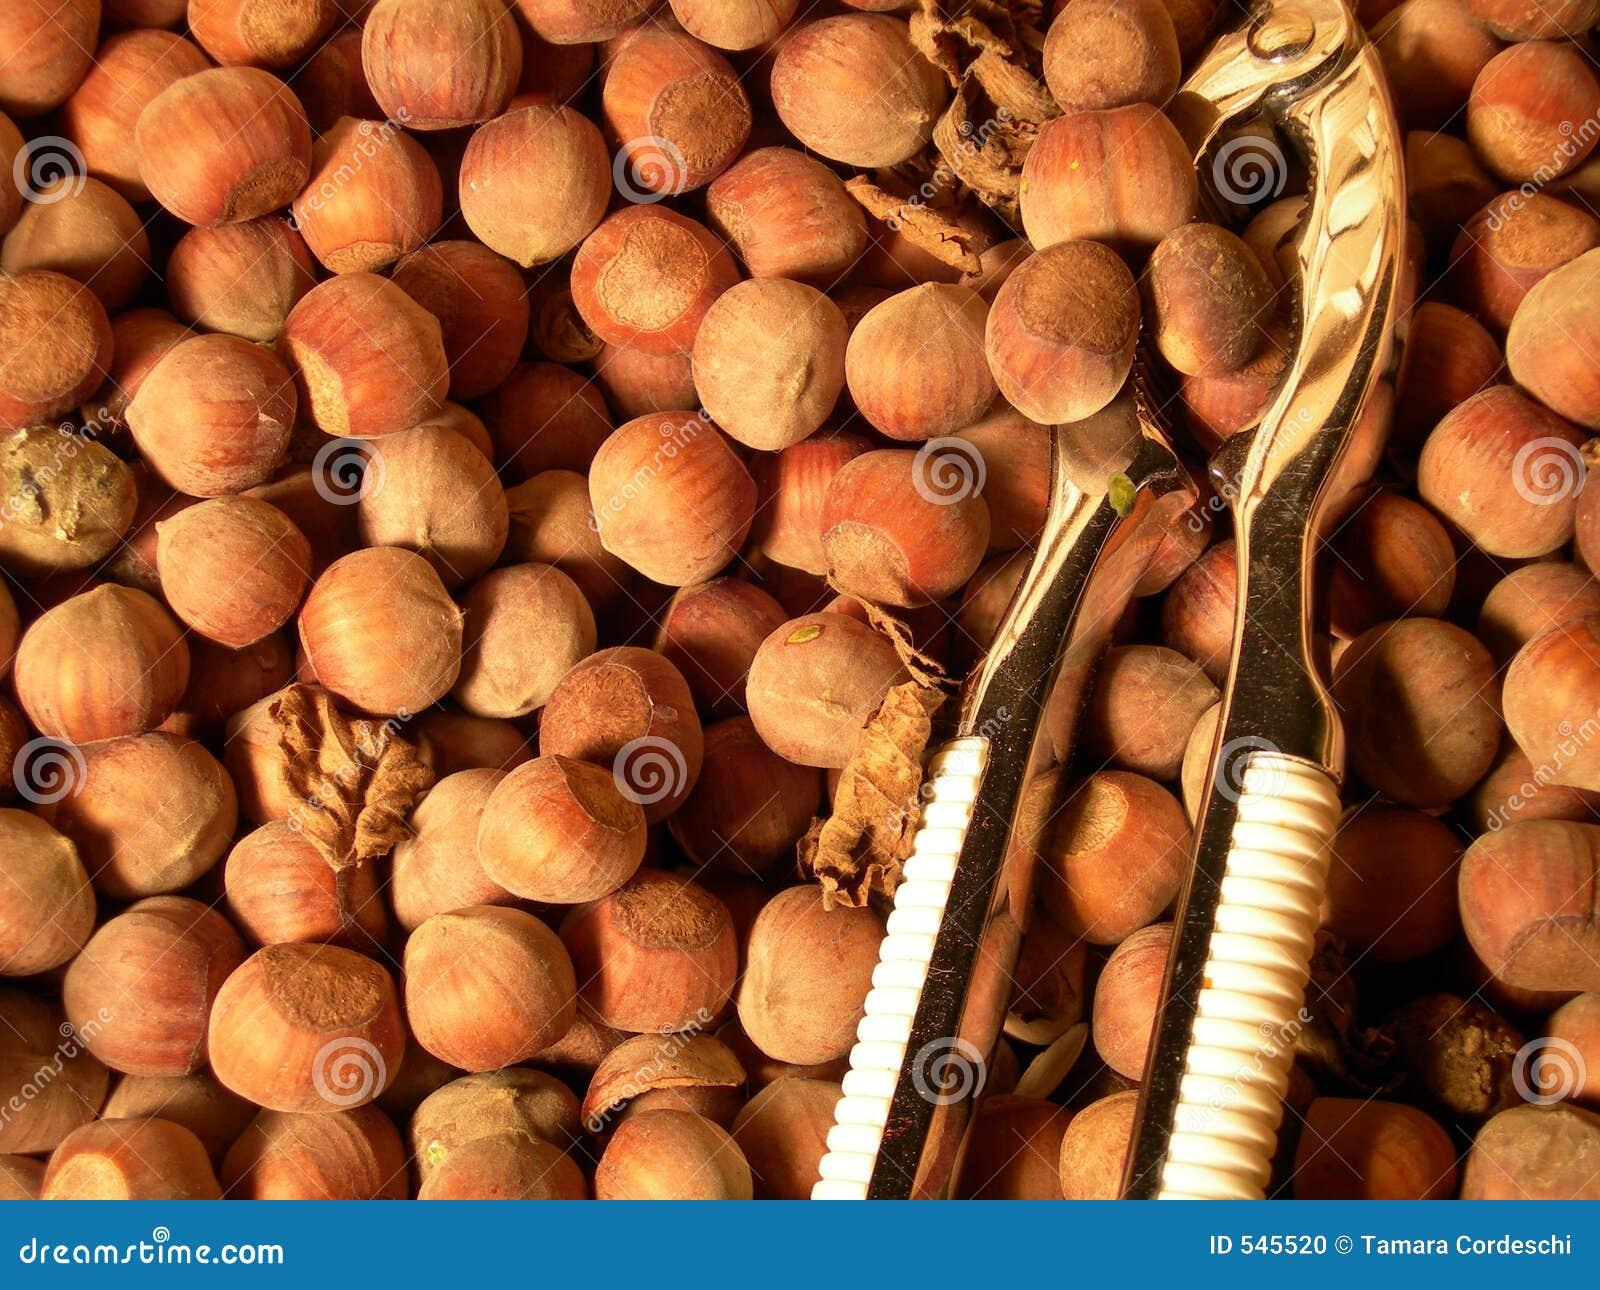 Download 榛子 库存照片. 图片 包括有 browne, 易碎, 果子, 食物, 胡桃钳, 种子, 欧洲榛树, 榛子 - 545520